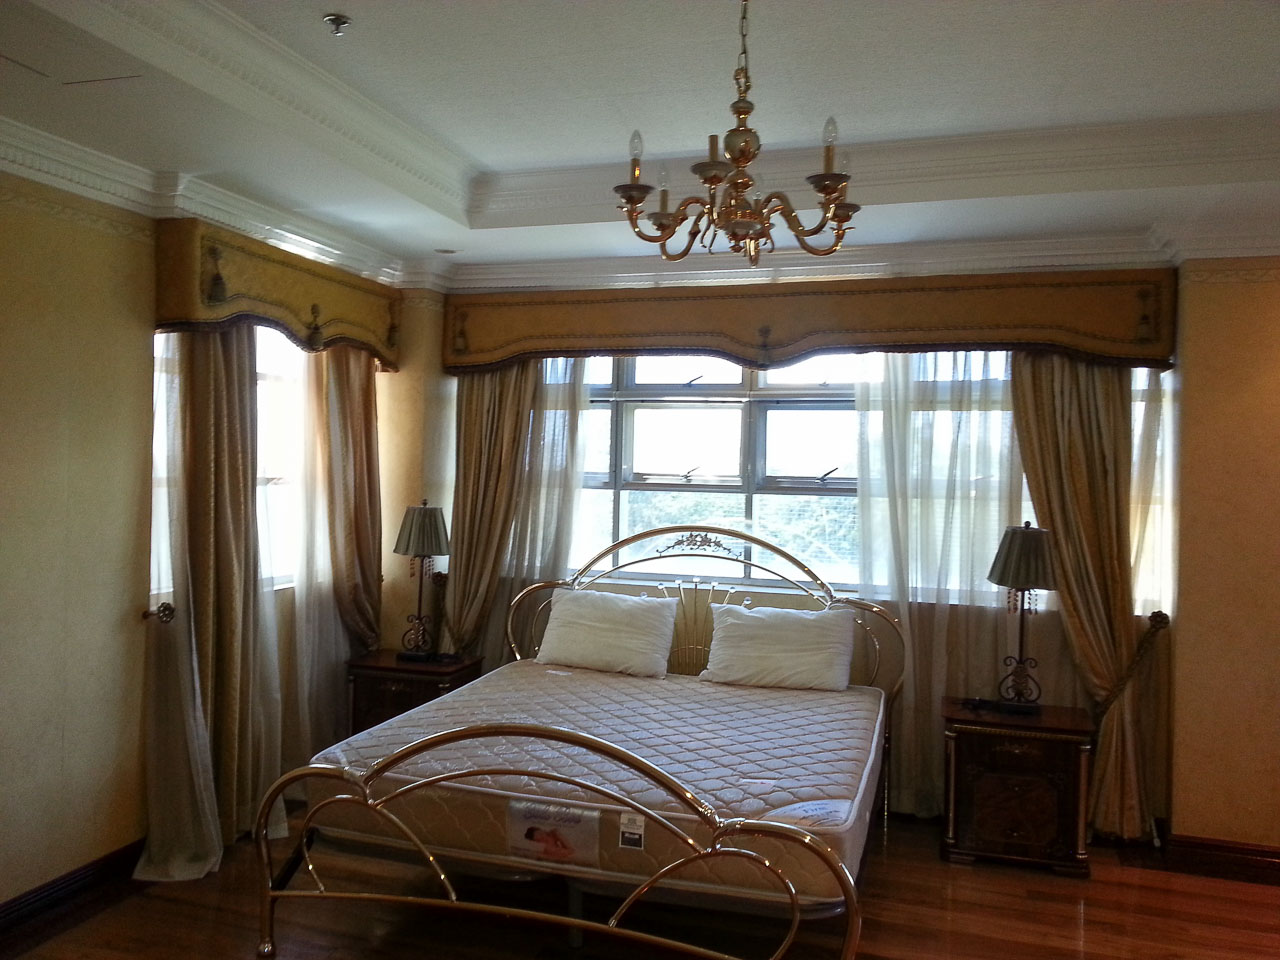 4 Bedroom Penthouse Condo For Rent In Cebu Banilad • Cebu